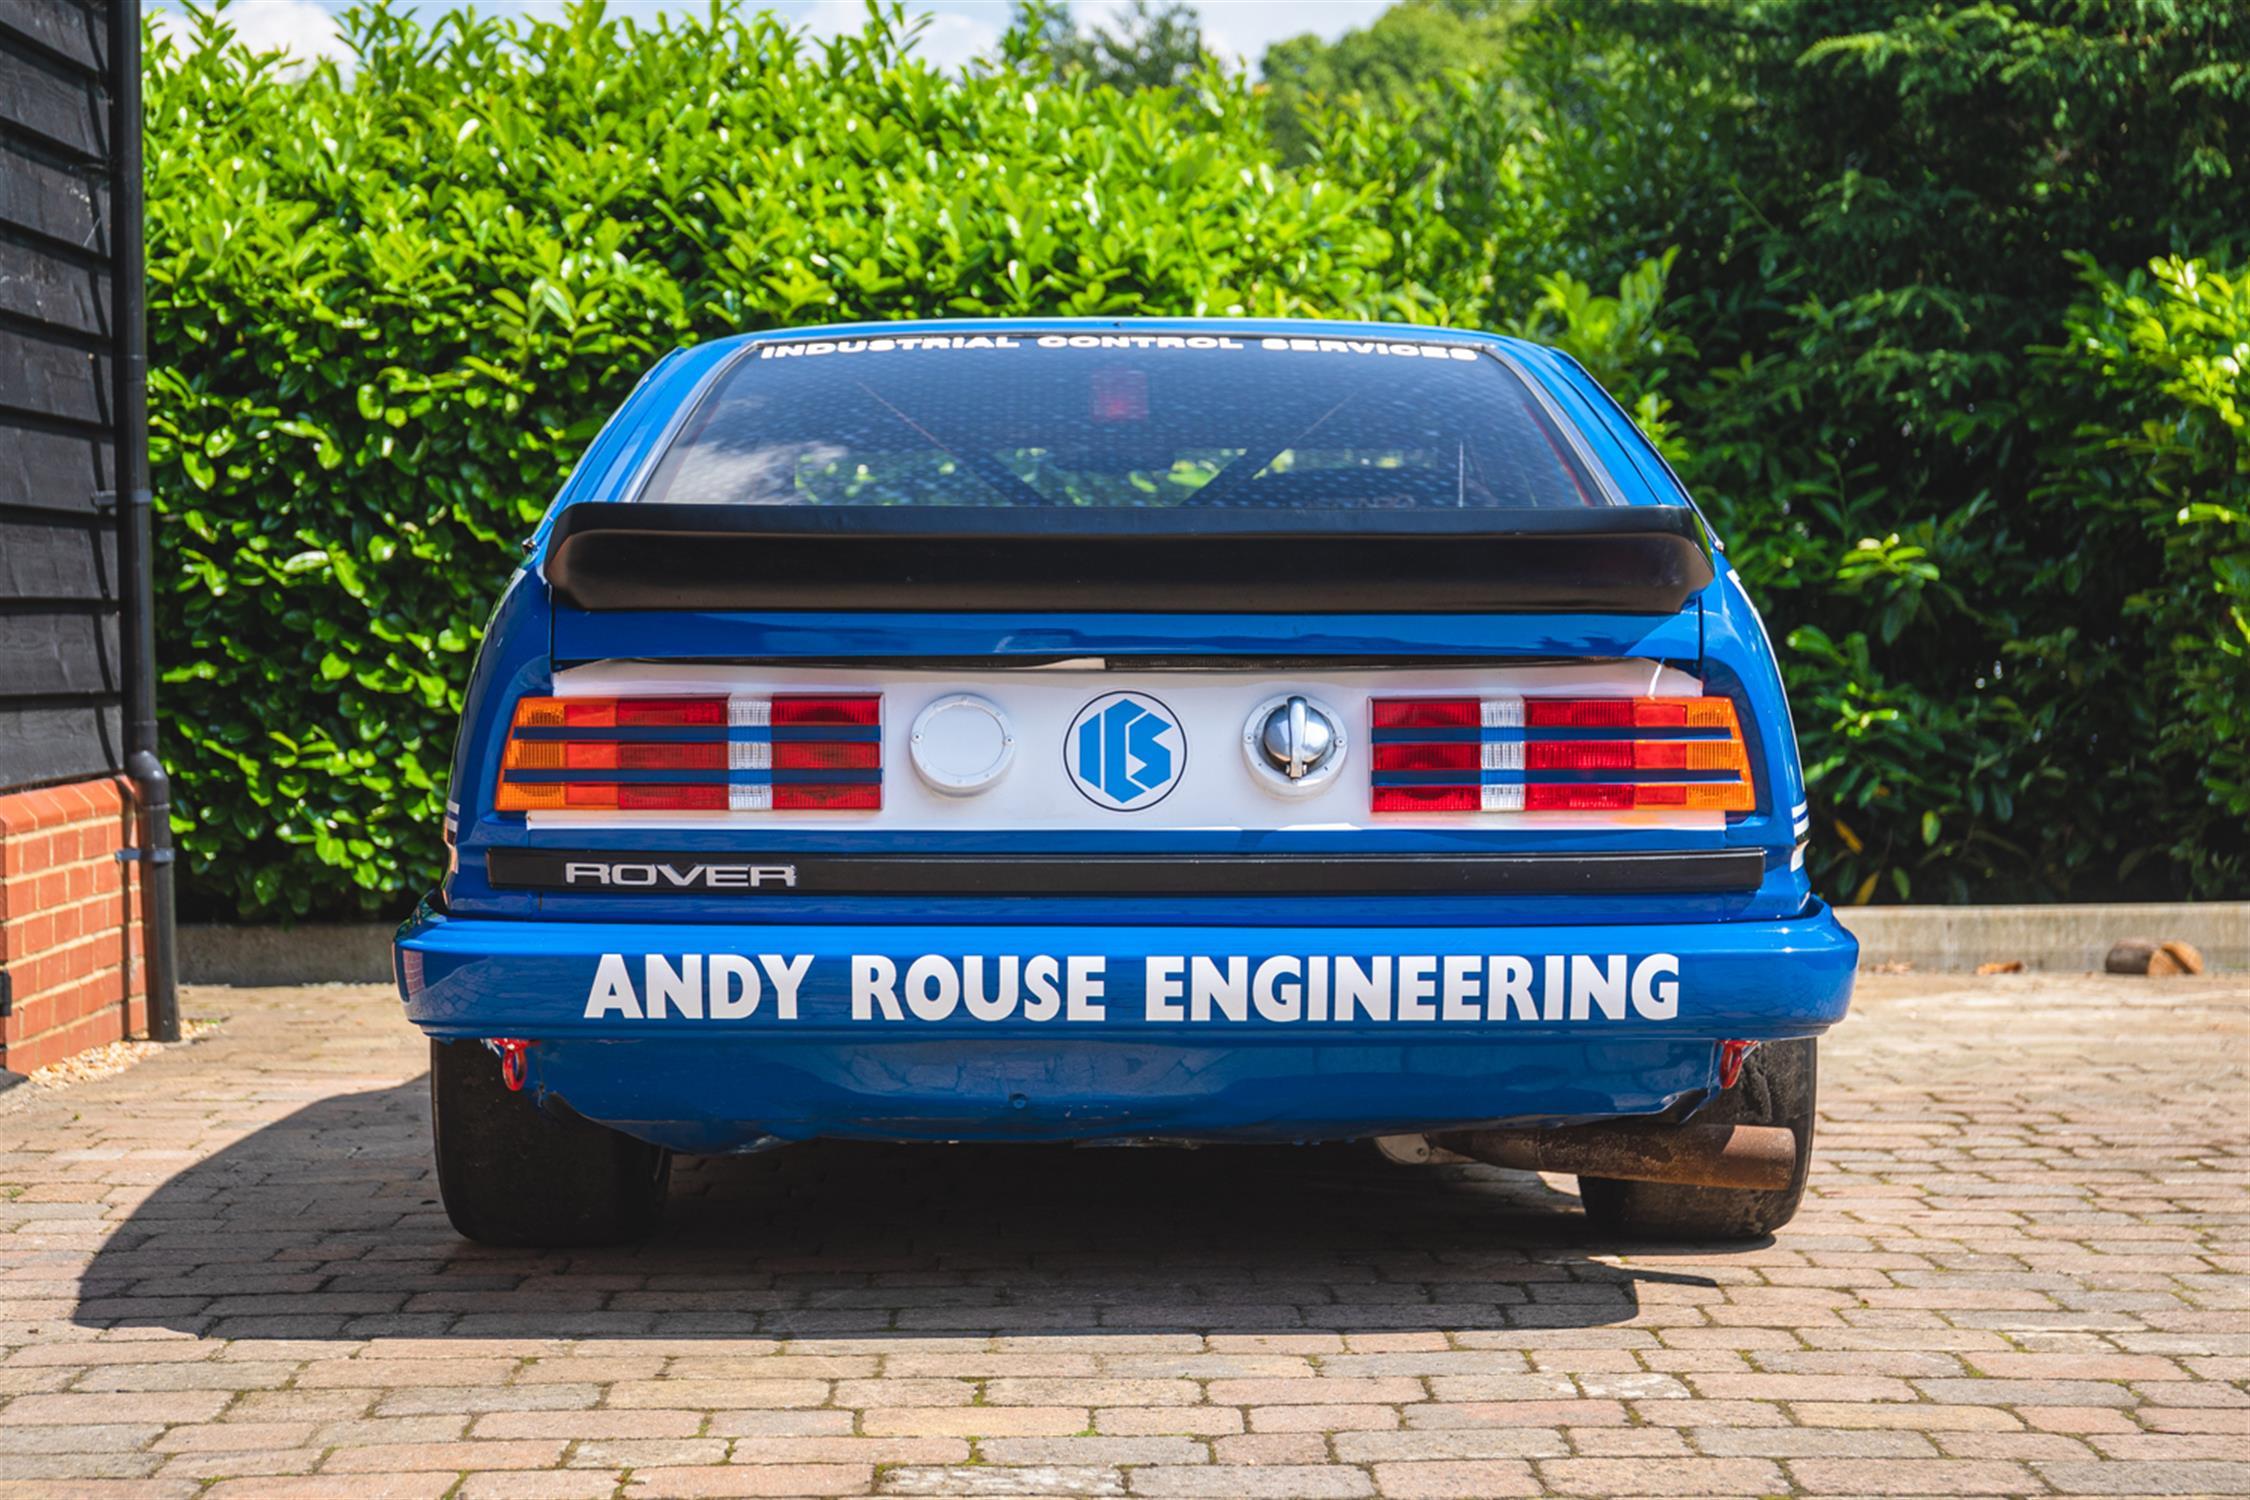 BTCC Championship-Winning 'Group A' ICS Rover Vitesse - Ex-Andy Rouse - Image 4 of 12